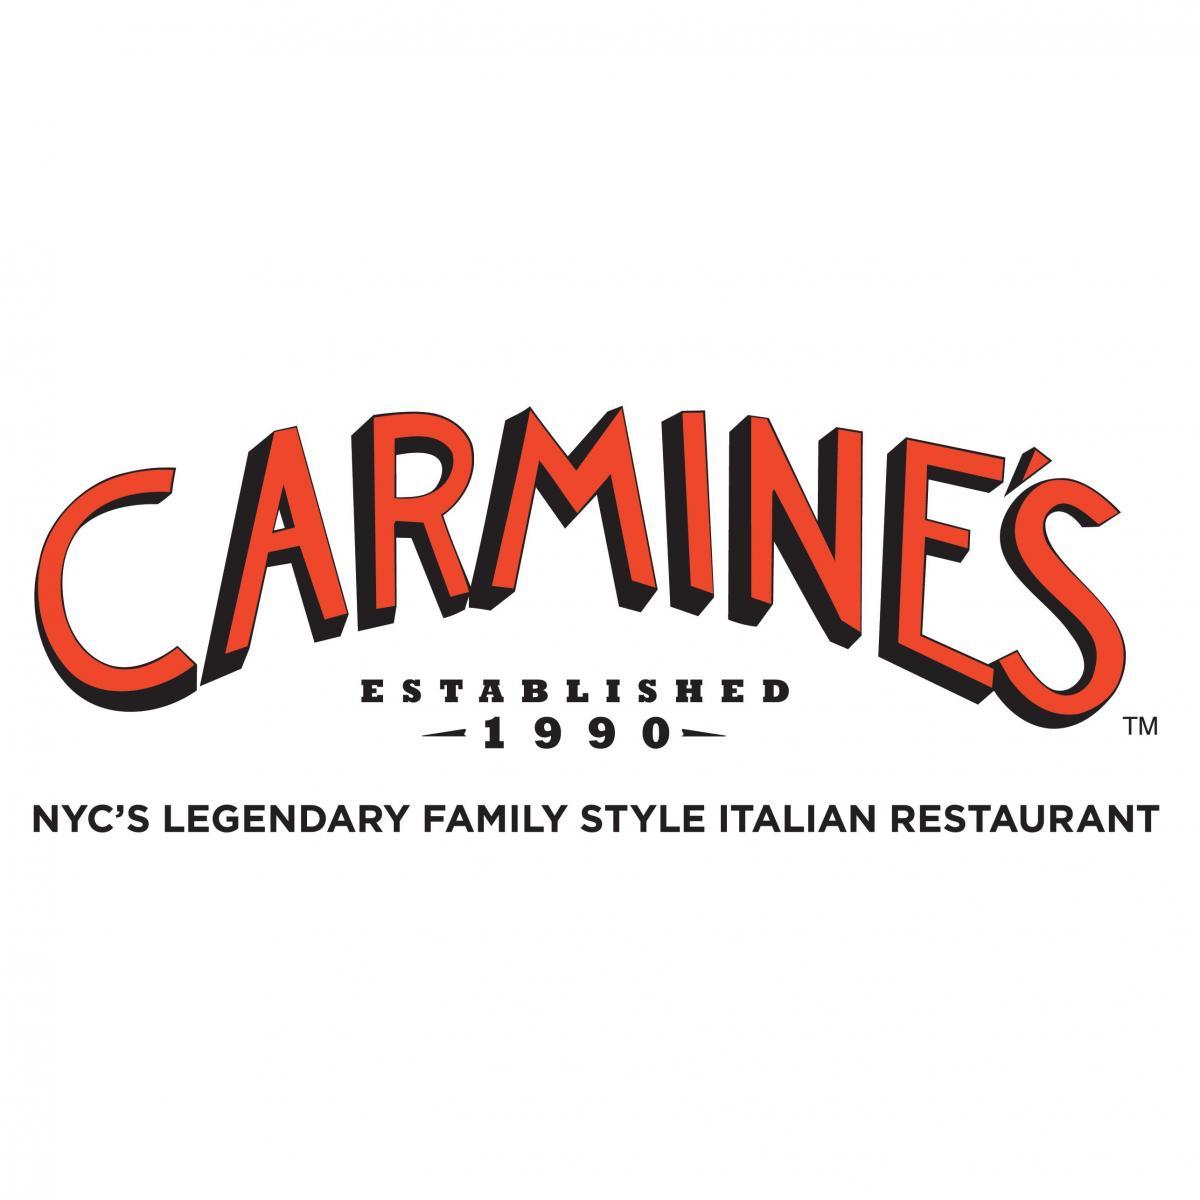 Carmine's Italian Restaurant - Las Vegas | The Forum Shops